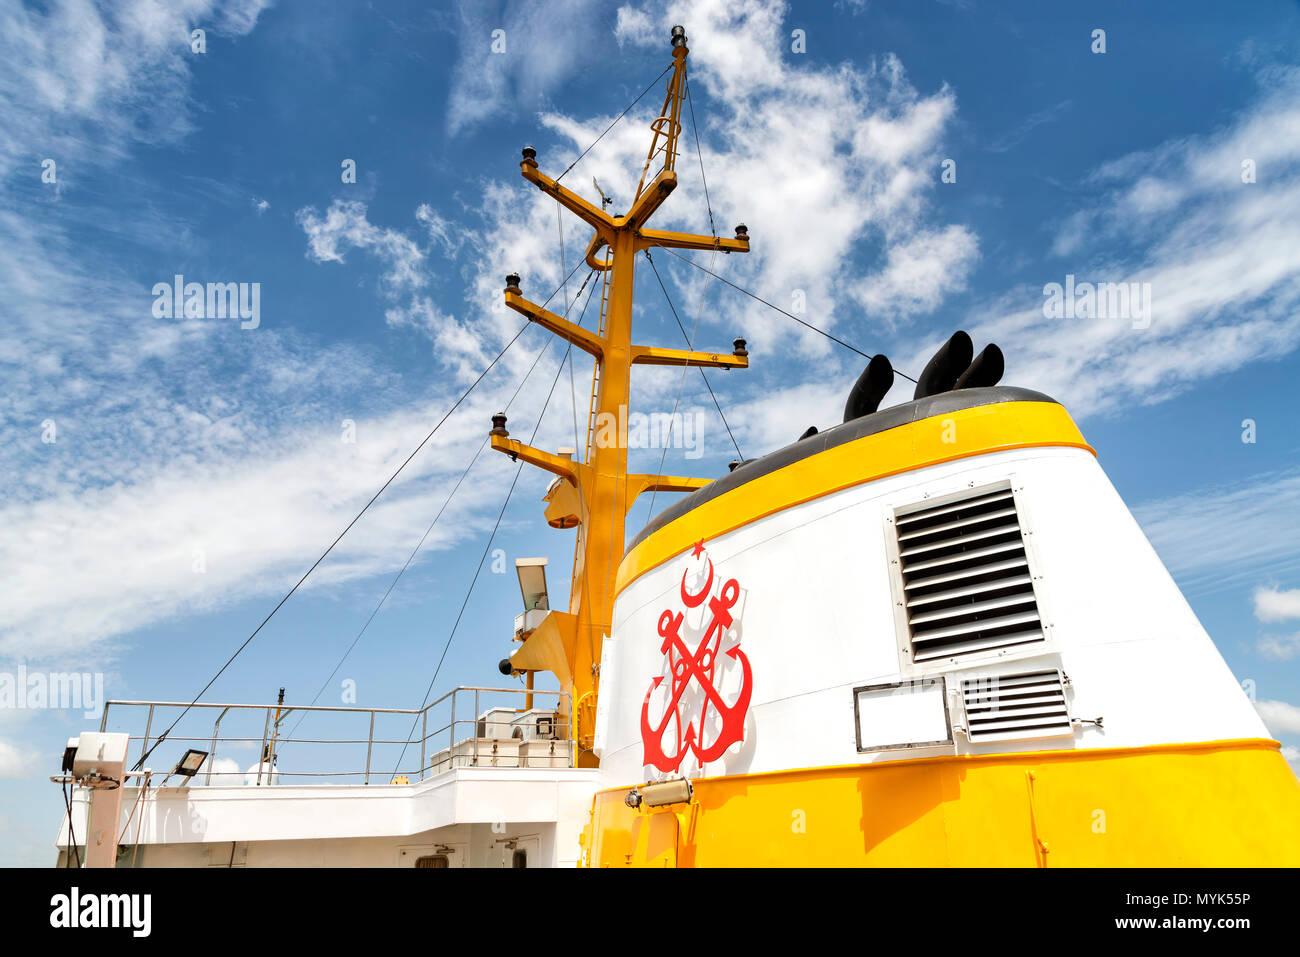 Funnel Of A Sehir Hatlari Passenger Ship, Istanbul, Turkey - Stock Image